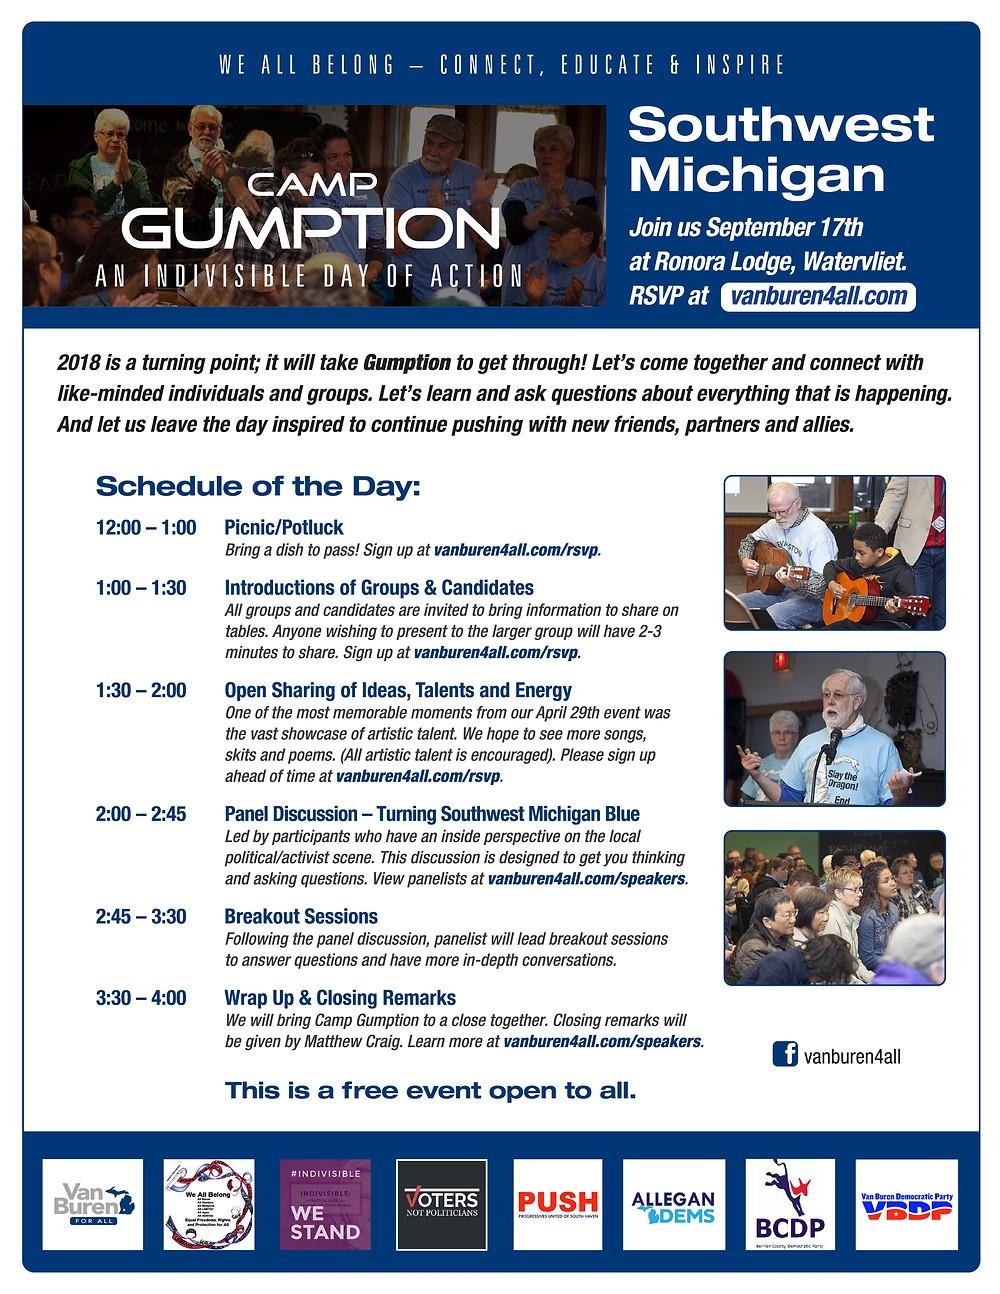 Camp Gumption Flyer, Event 9-17-17